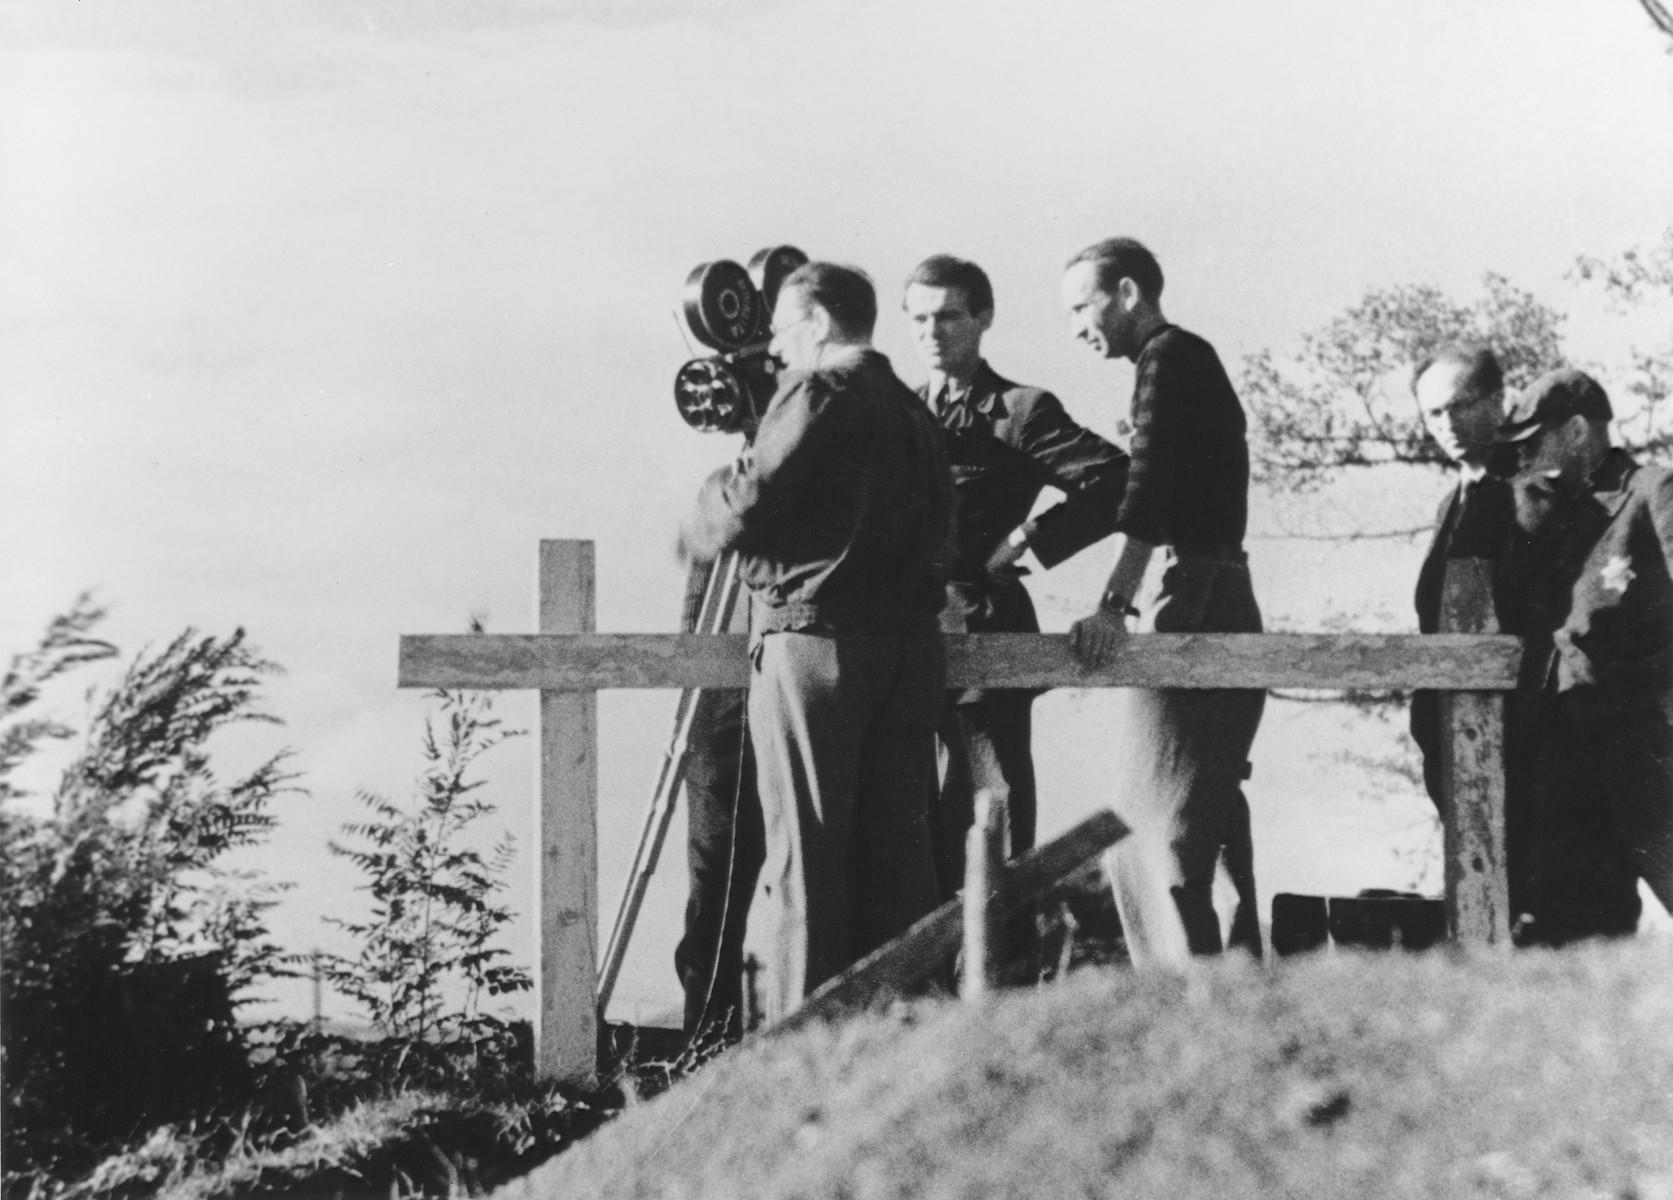 "A film crew takes motion pictures in the Theresienstadt ghetto during the filming of  the Nazi propaganda film ""Der Fuehrer Schenkt den Juden eine Stadt"" [The Fuehrer gives the Jews a City].  Ivan Fric is pictured in the middle of the film crew."